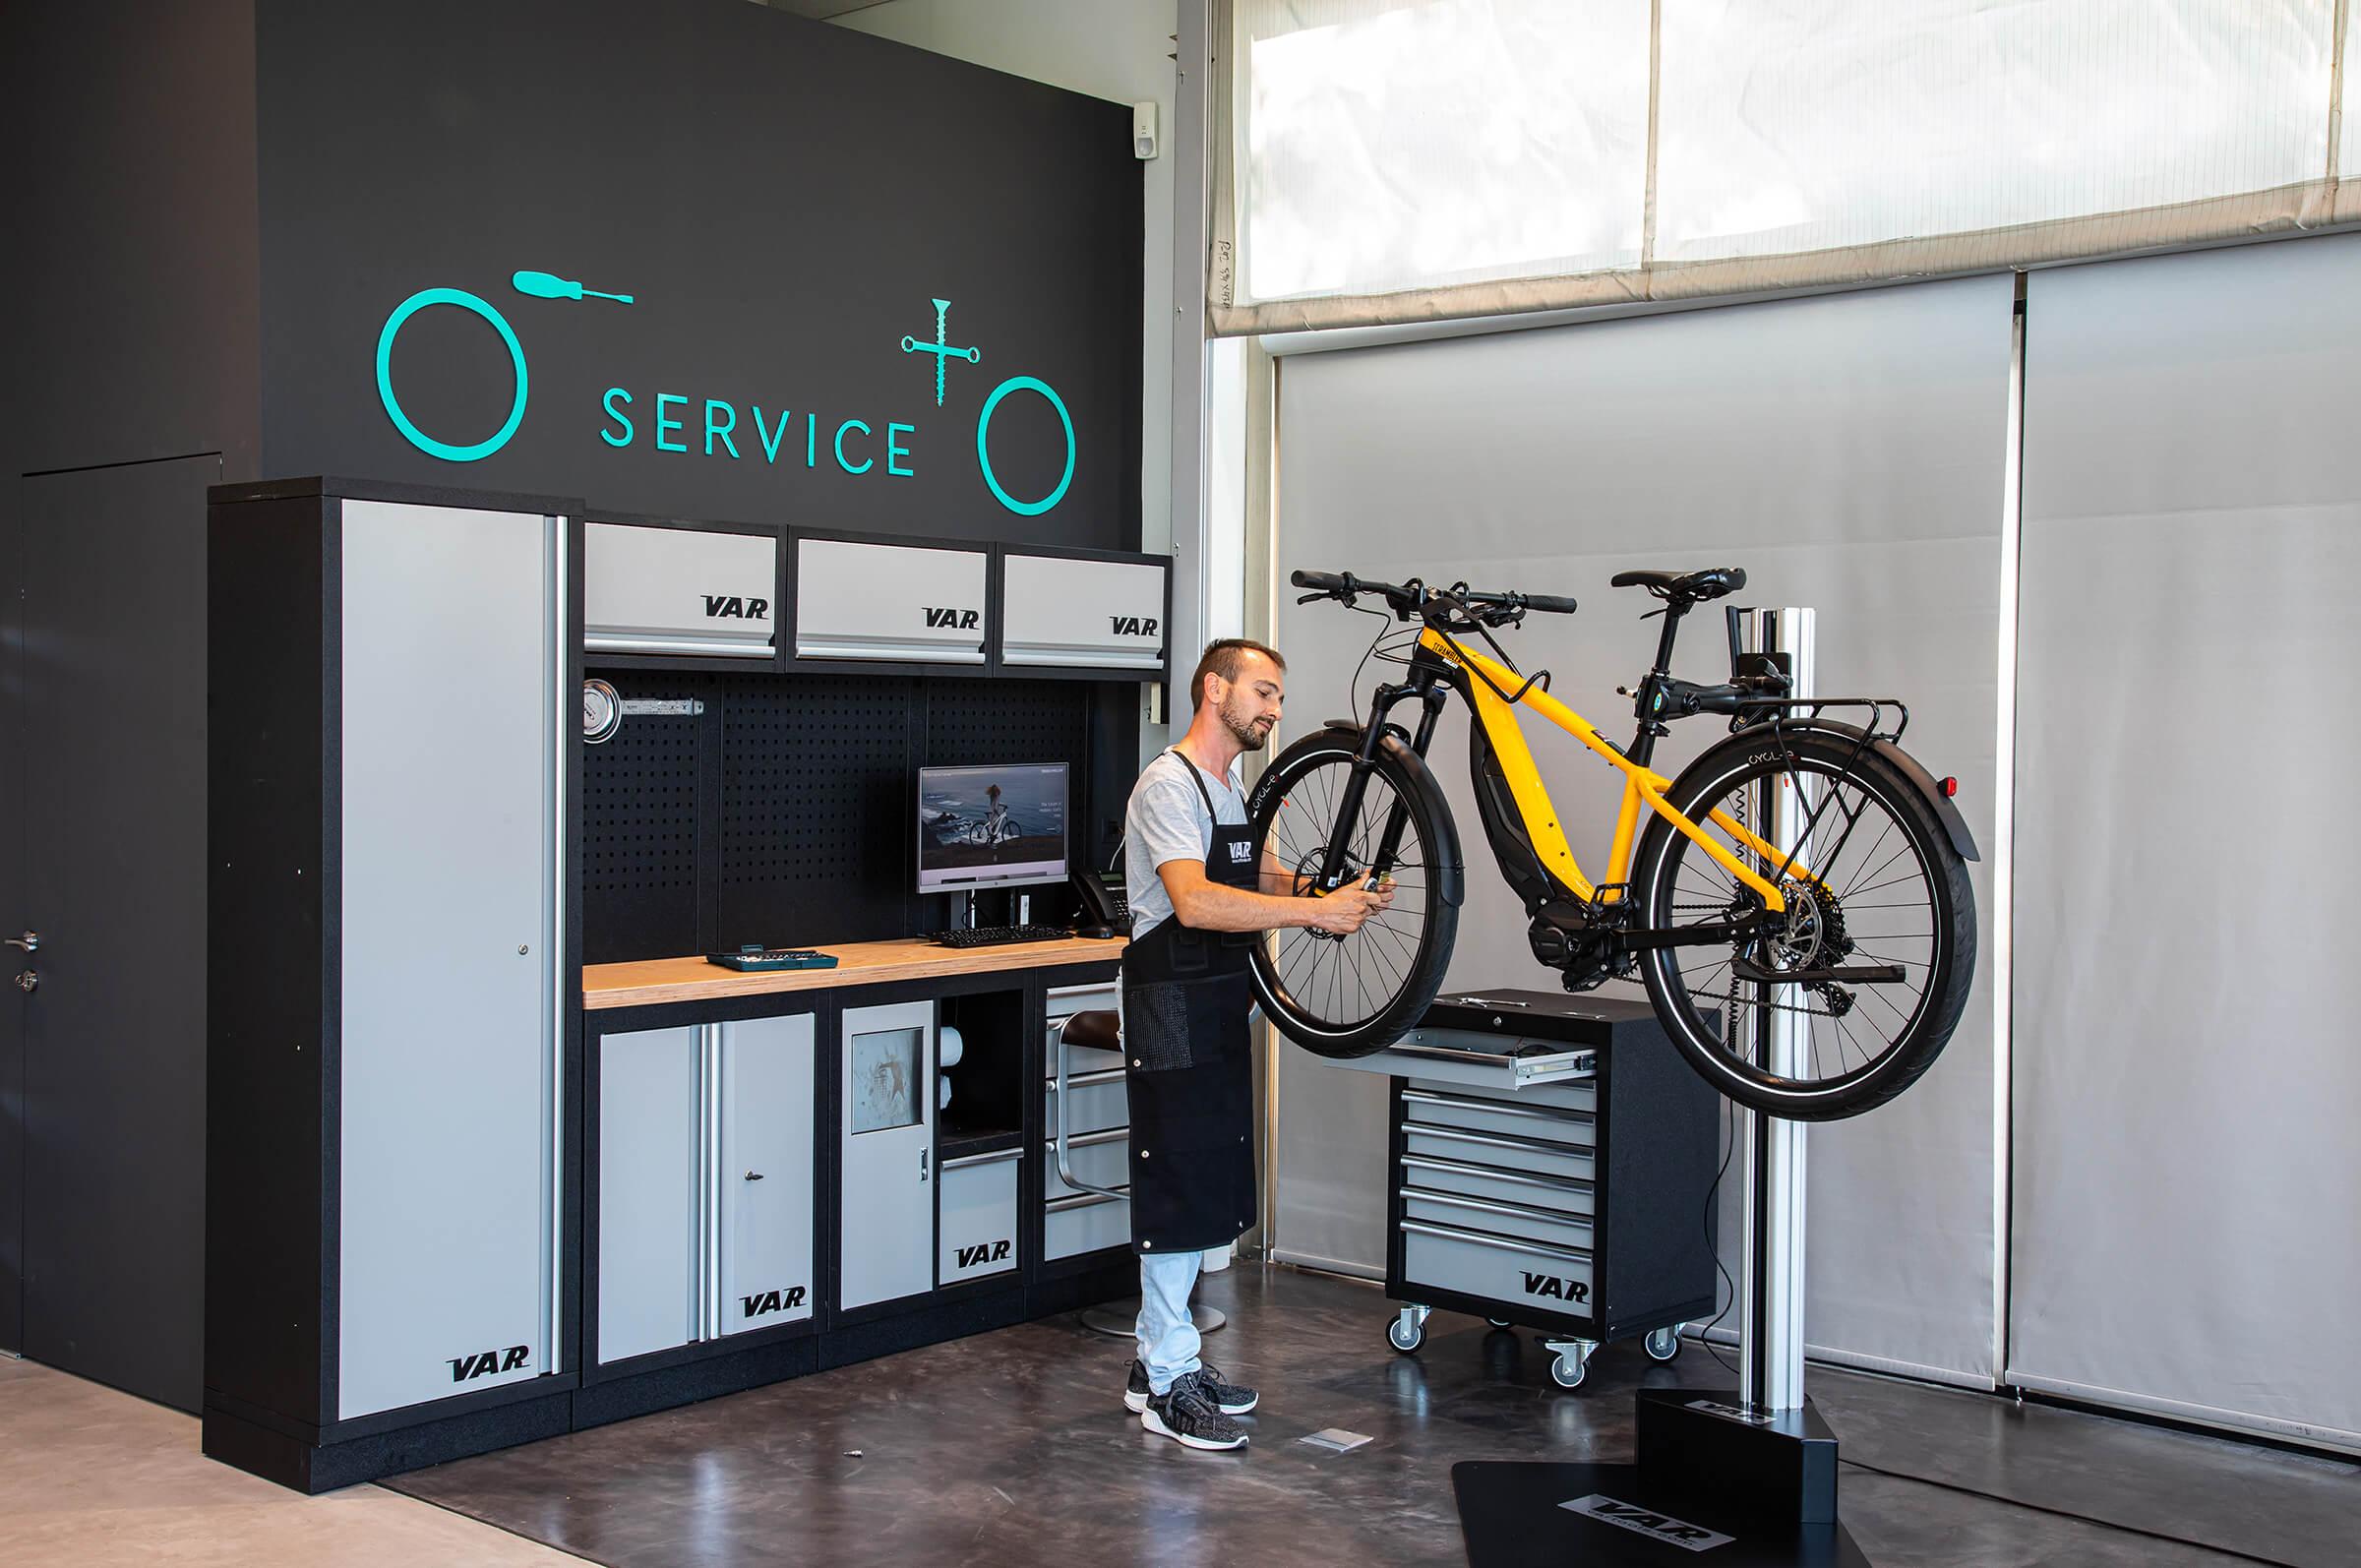 Kosmoride After Sales - Εξειδικευμένο service e-Bikes